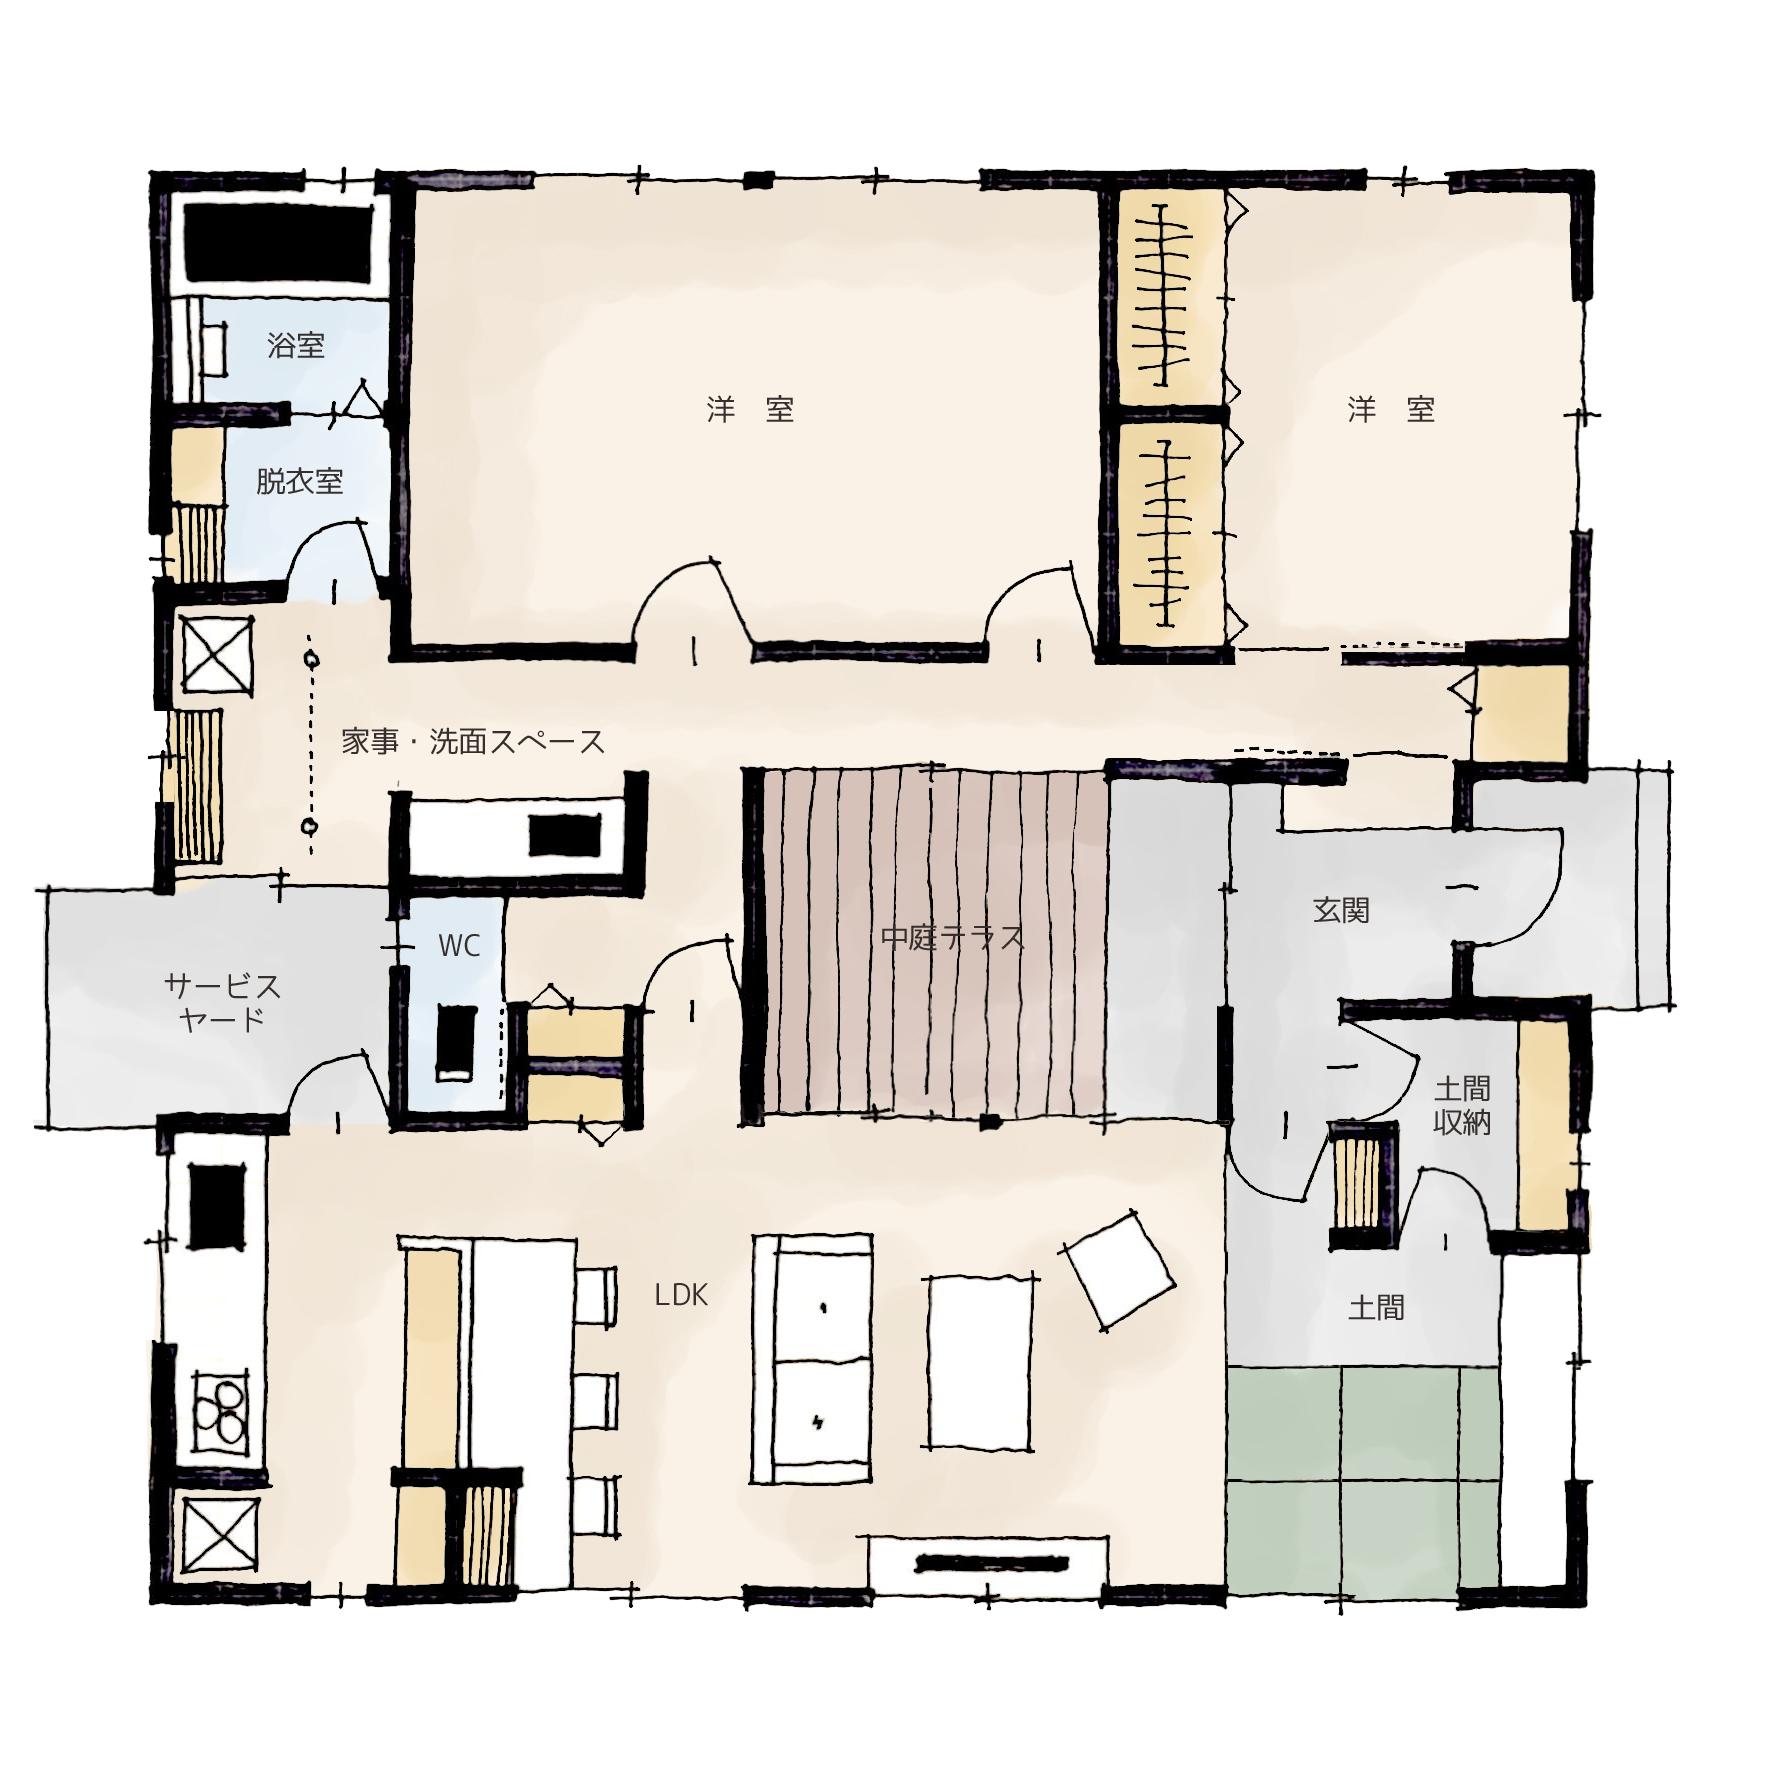 【SUUMO】中庭のある家 間取り 平屋に関する注文 …